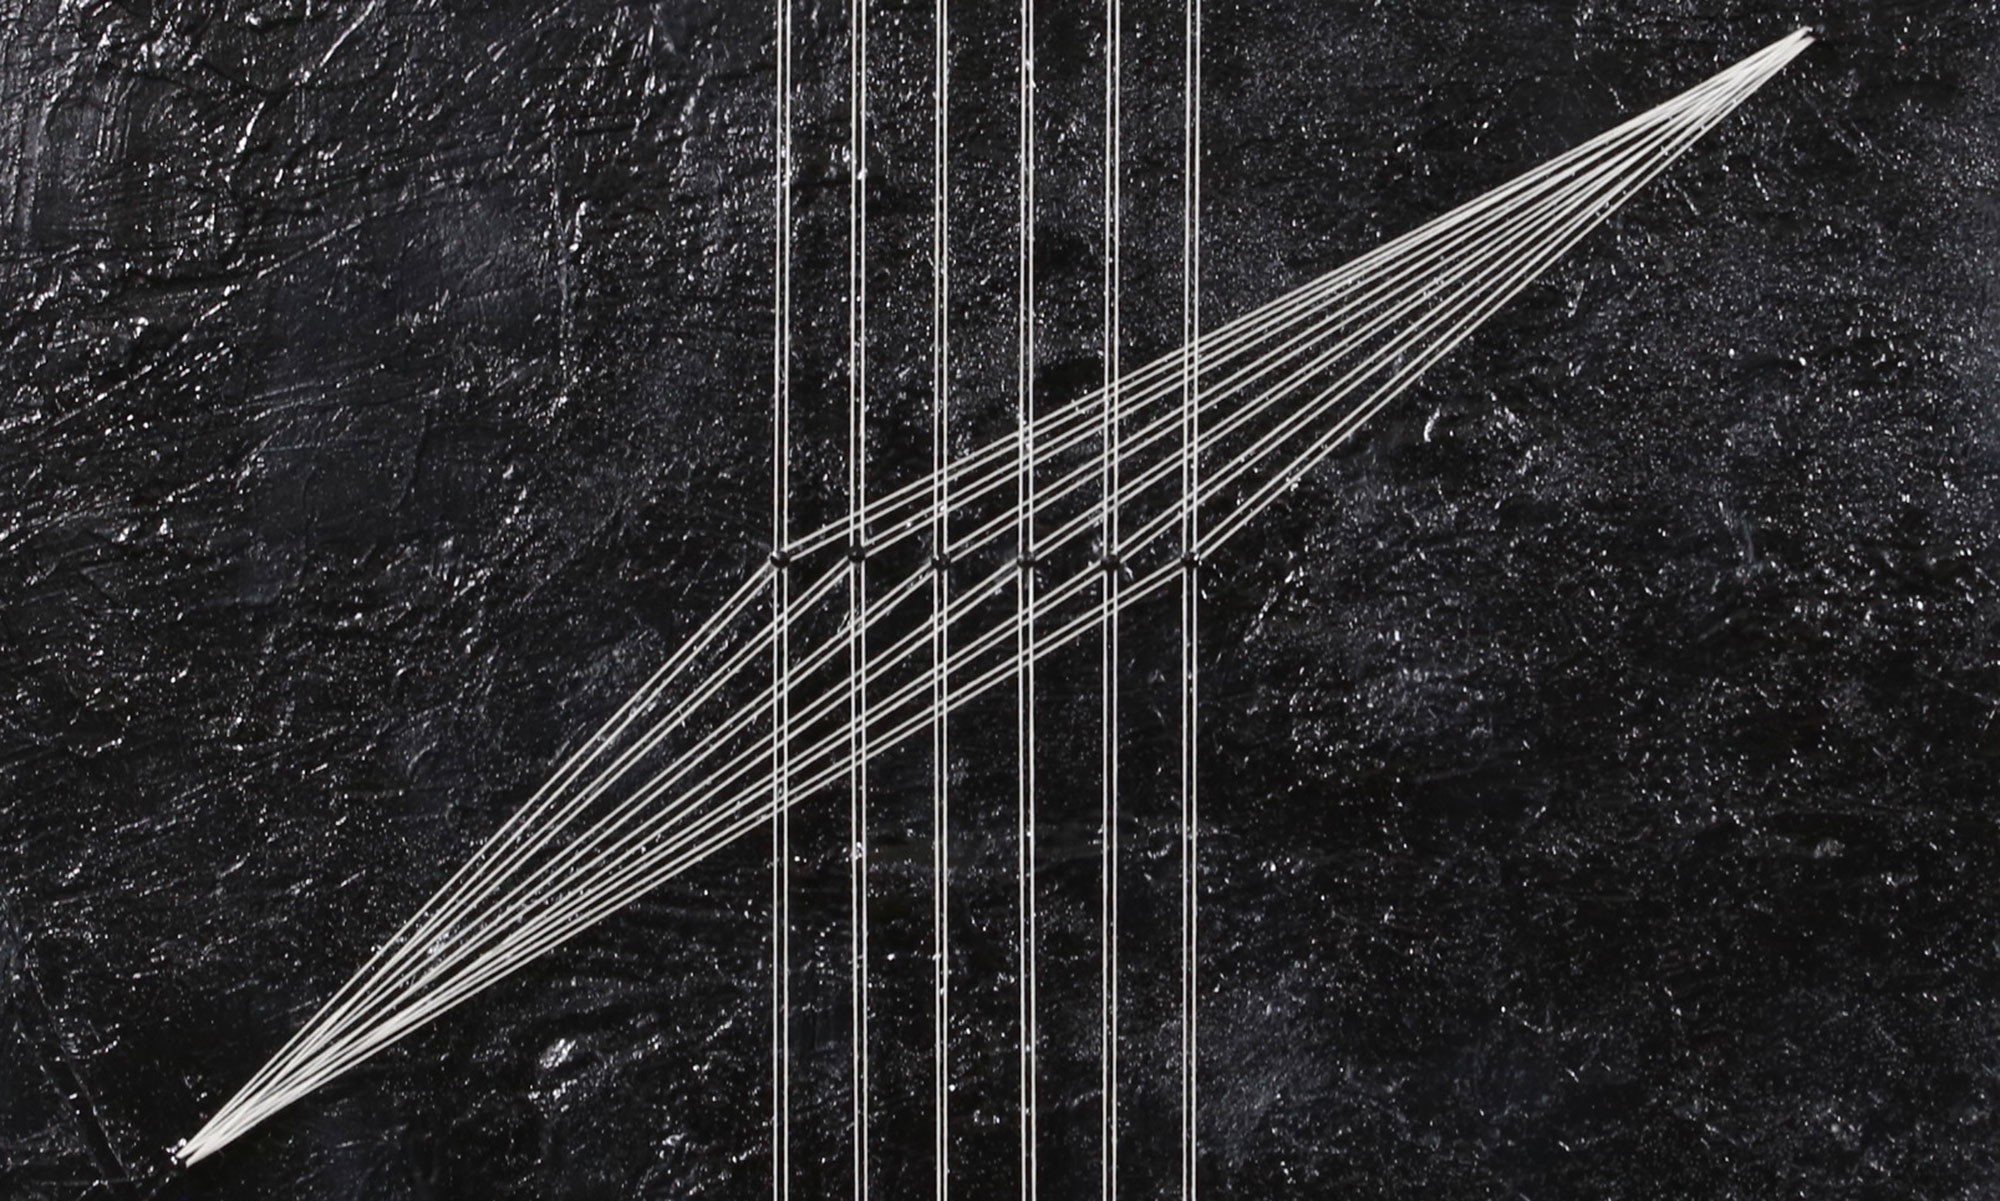 equilibrio-massimo-marchioro-fili-linee